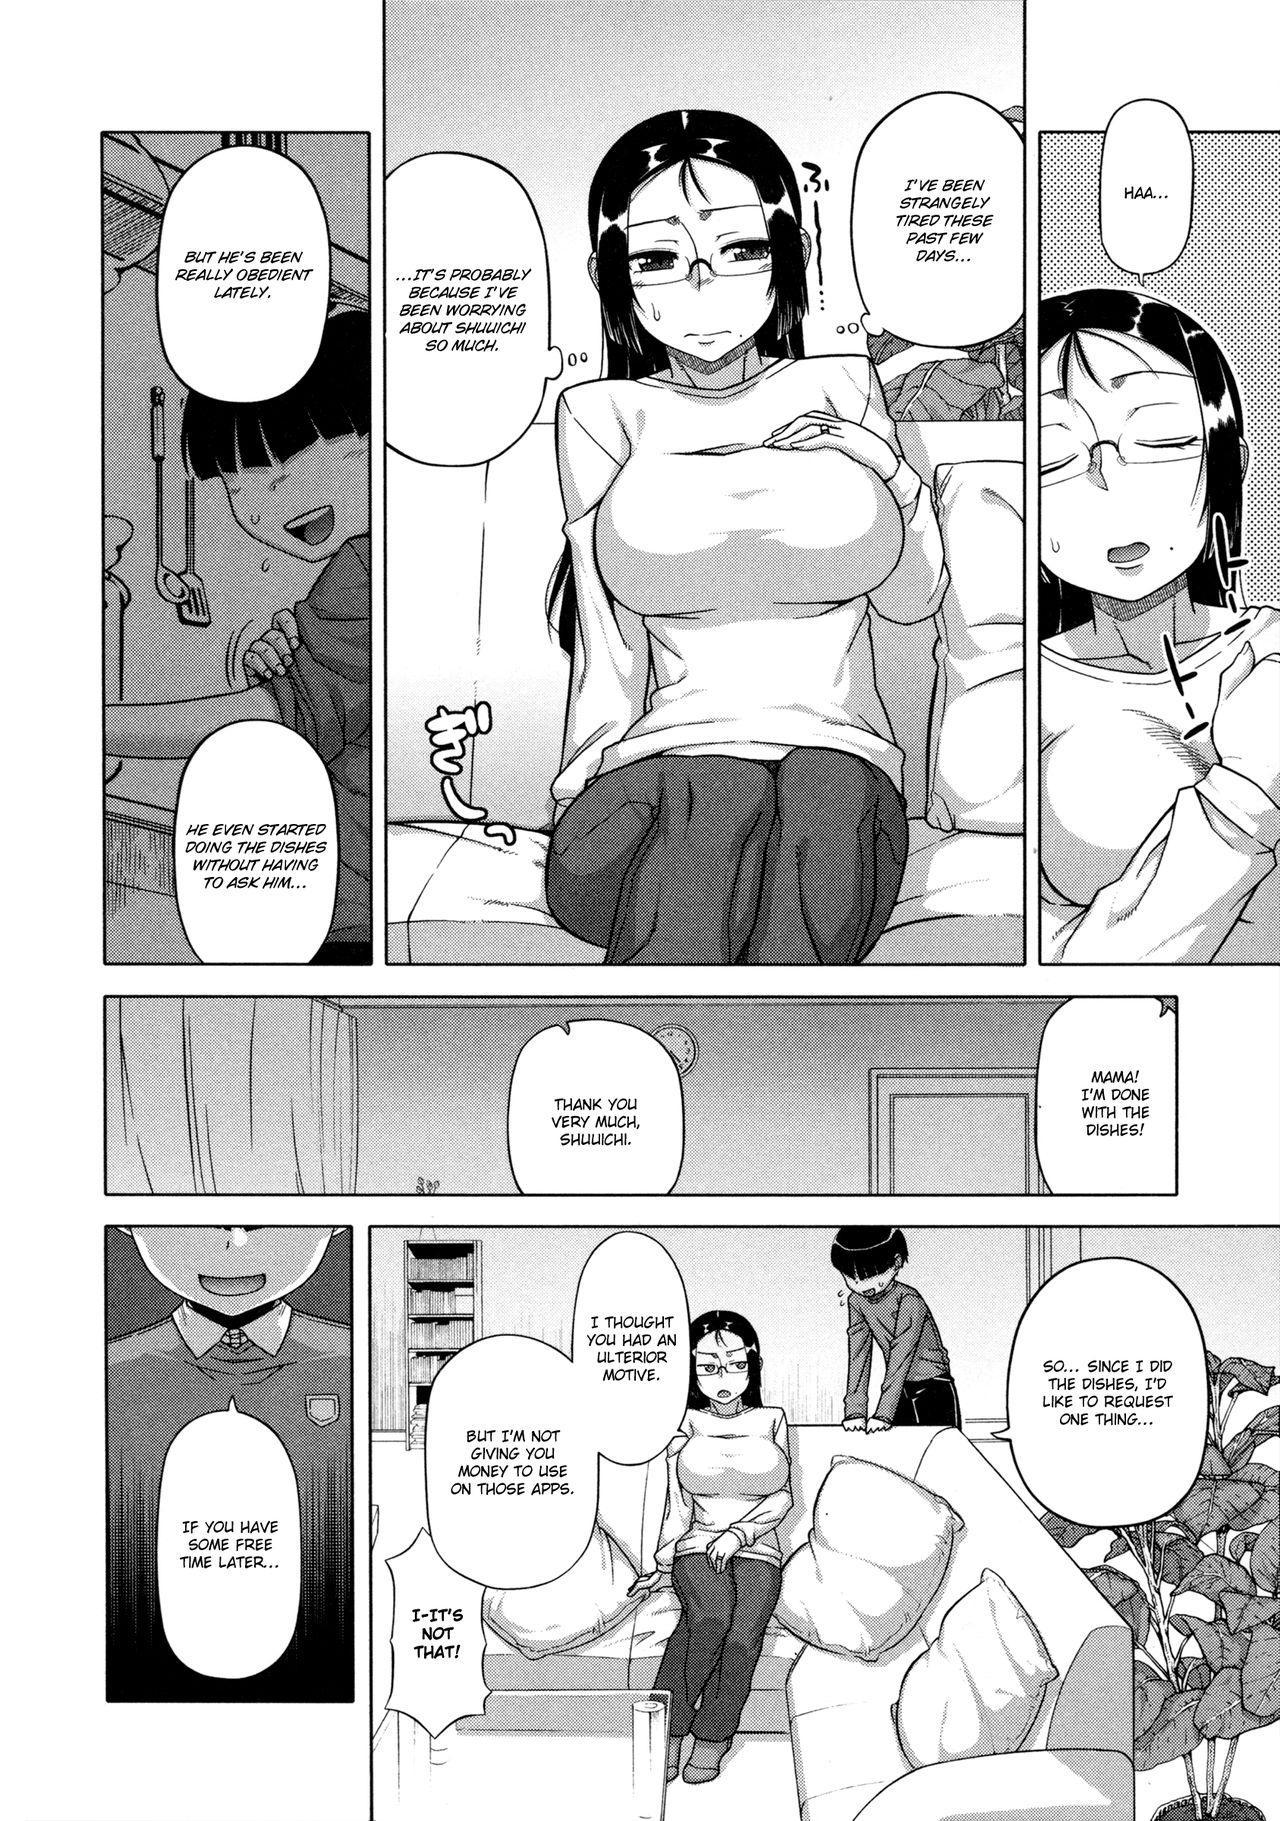 [Takatsu] Ou-sama Appli - King App [English] [TheRobotsGhost] 21